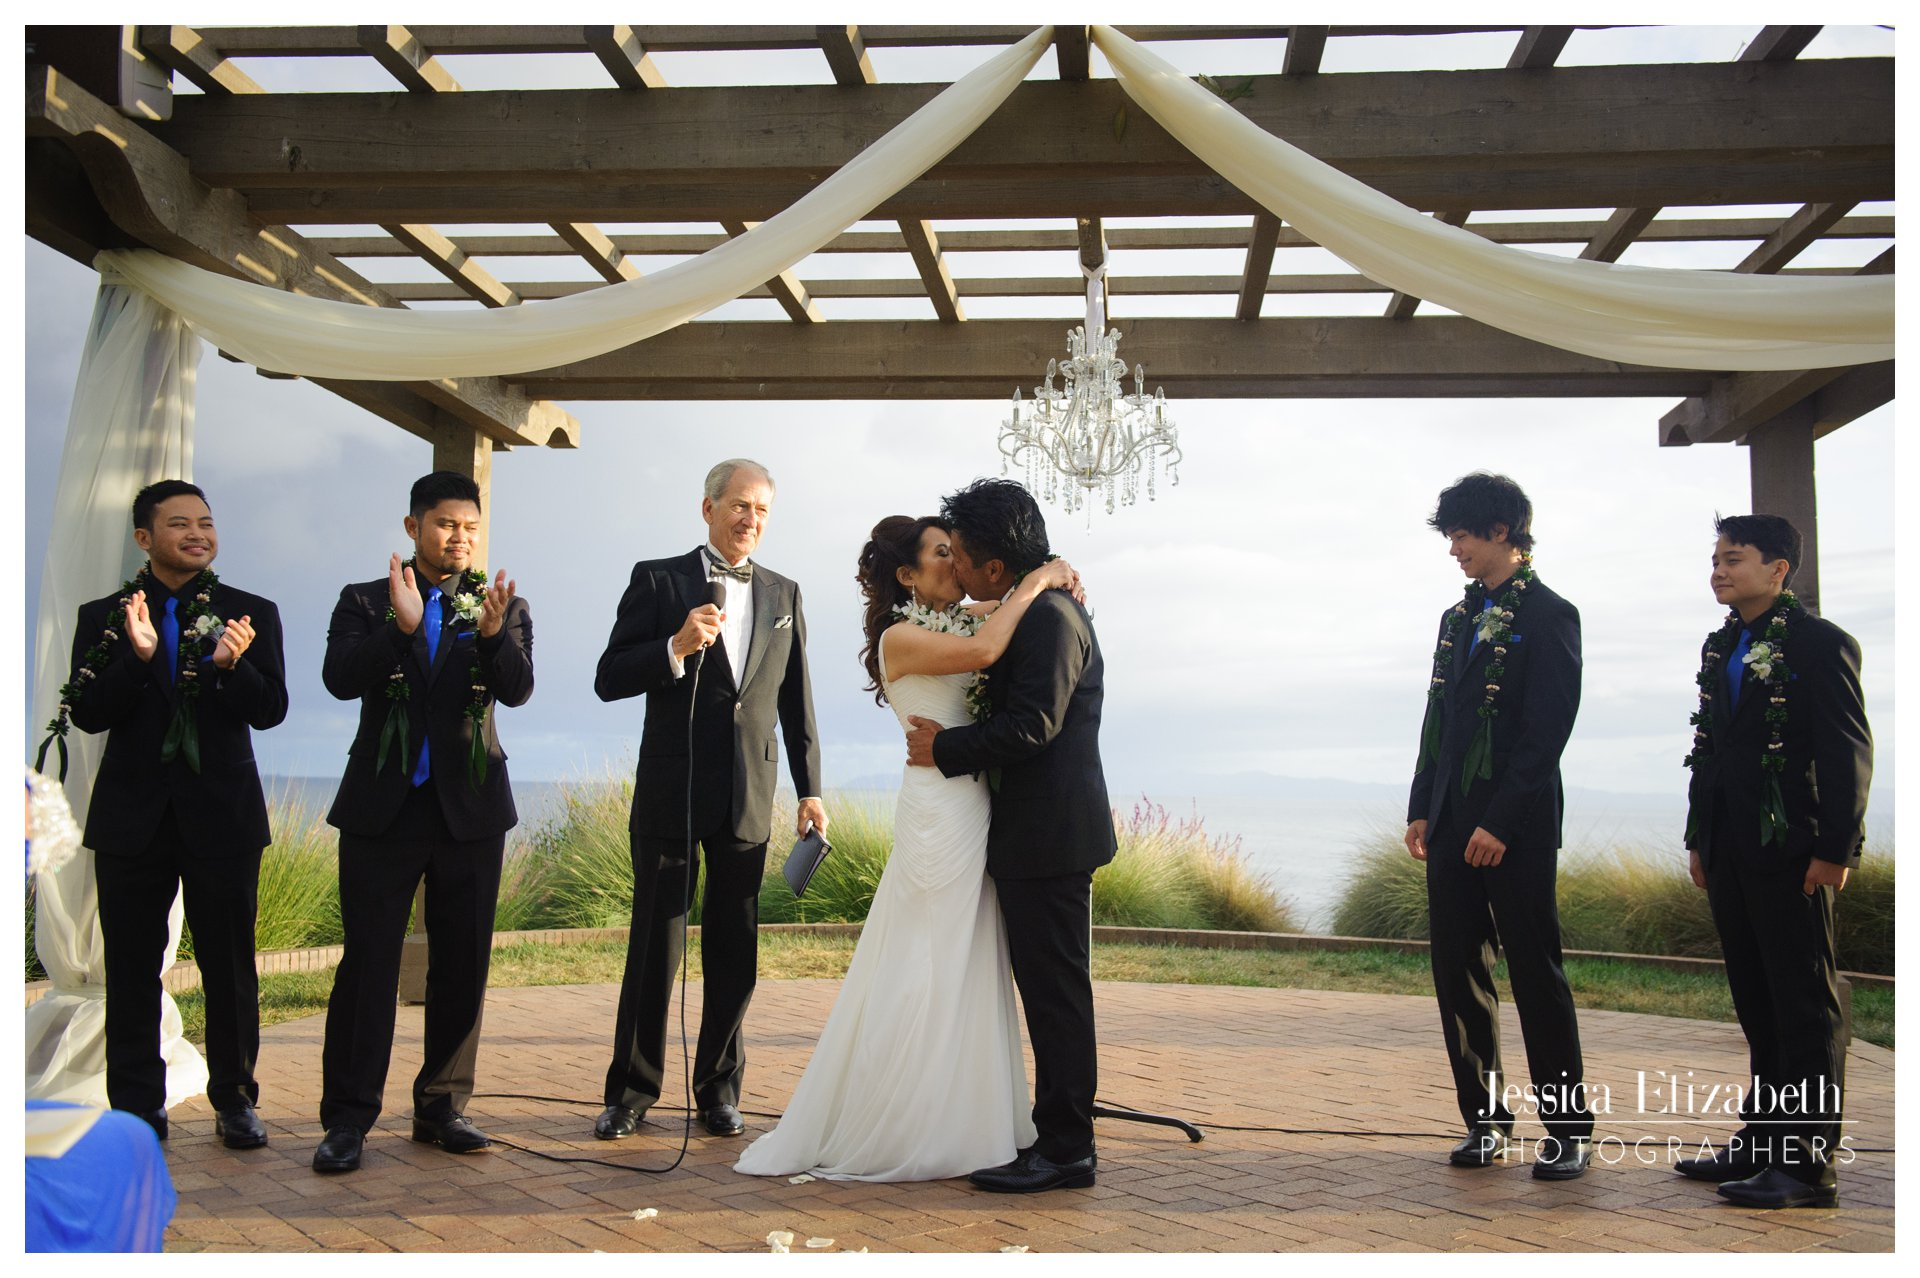 25-Terranea-Palos-Verdes-Wedding-Photography-by-Jessica-Elizabeth-w.jpg